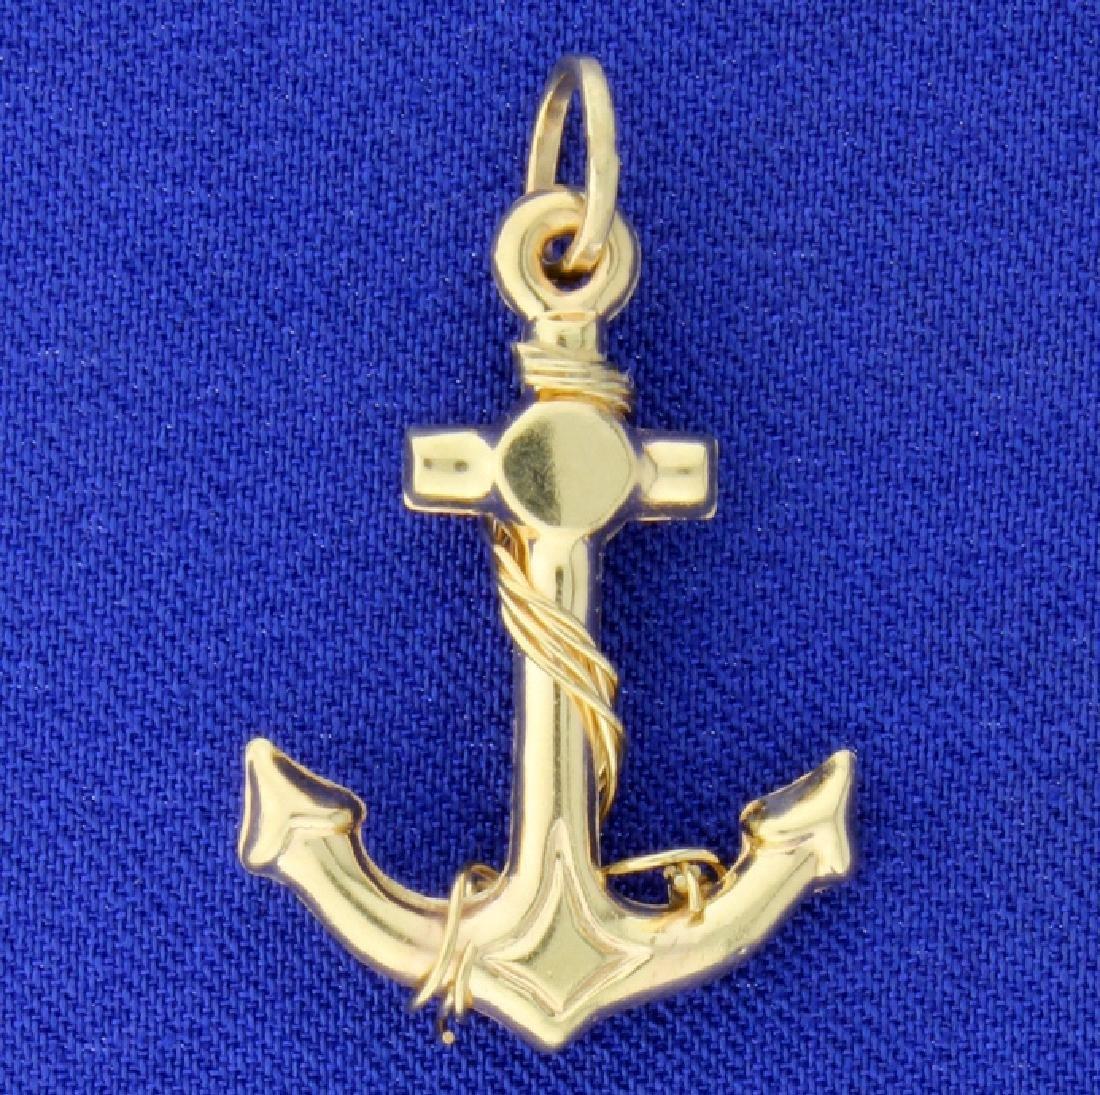 Anchor Pendant or Charm